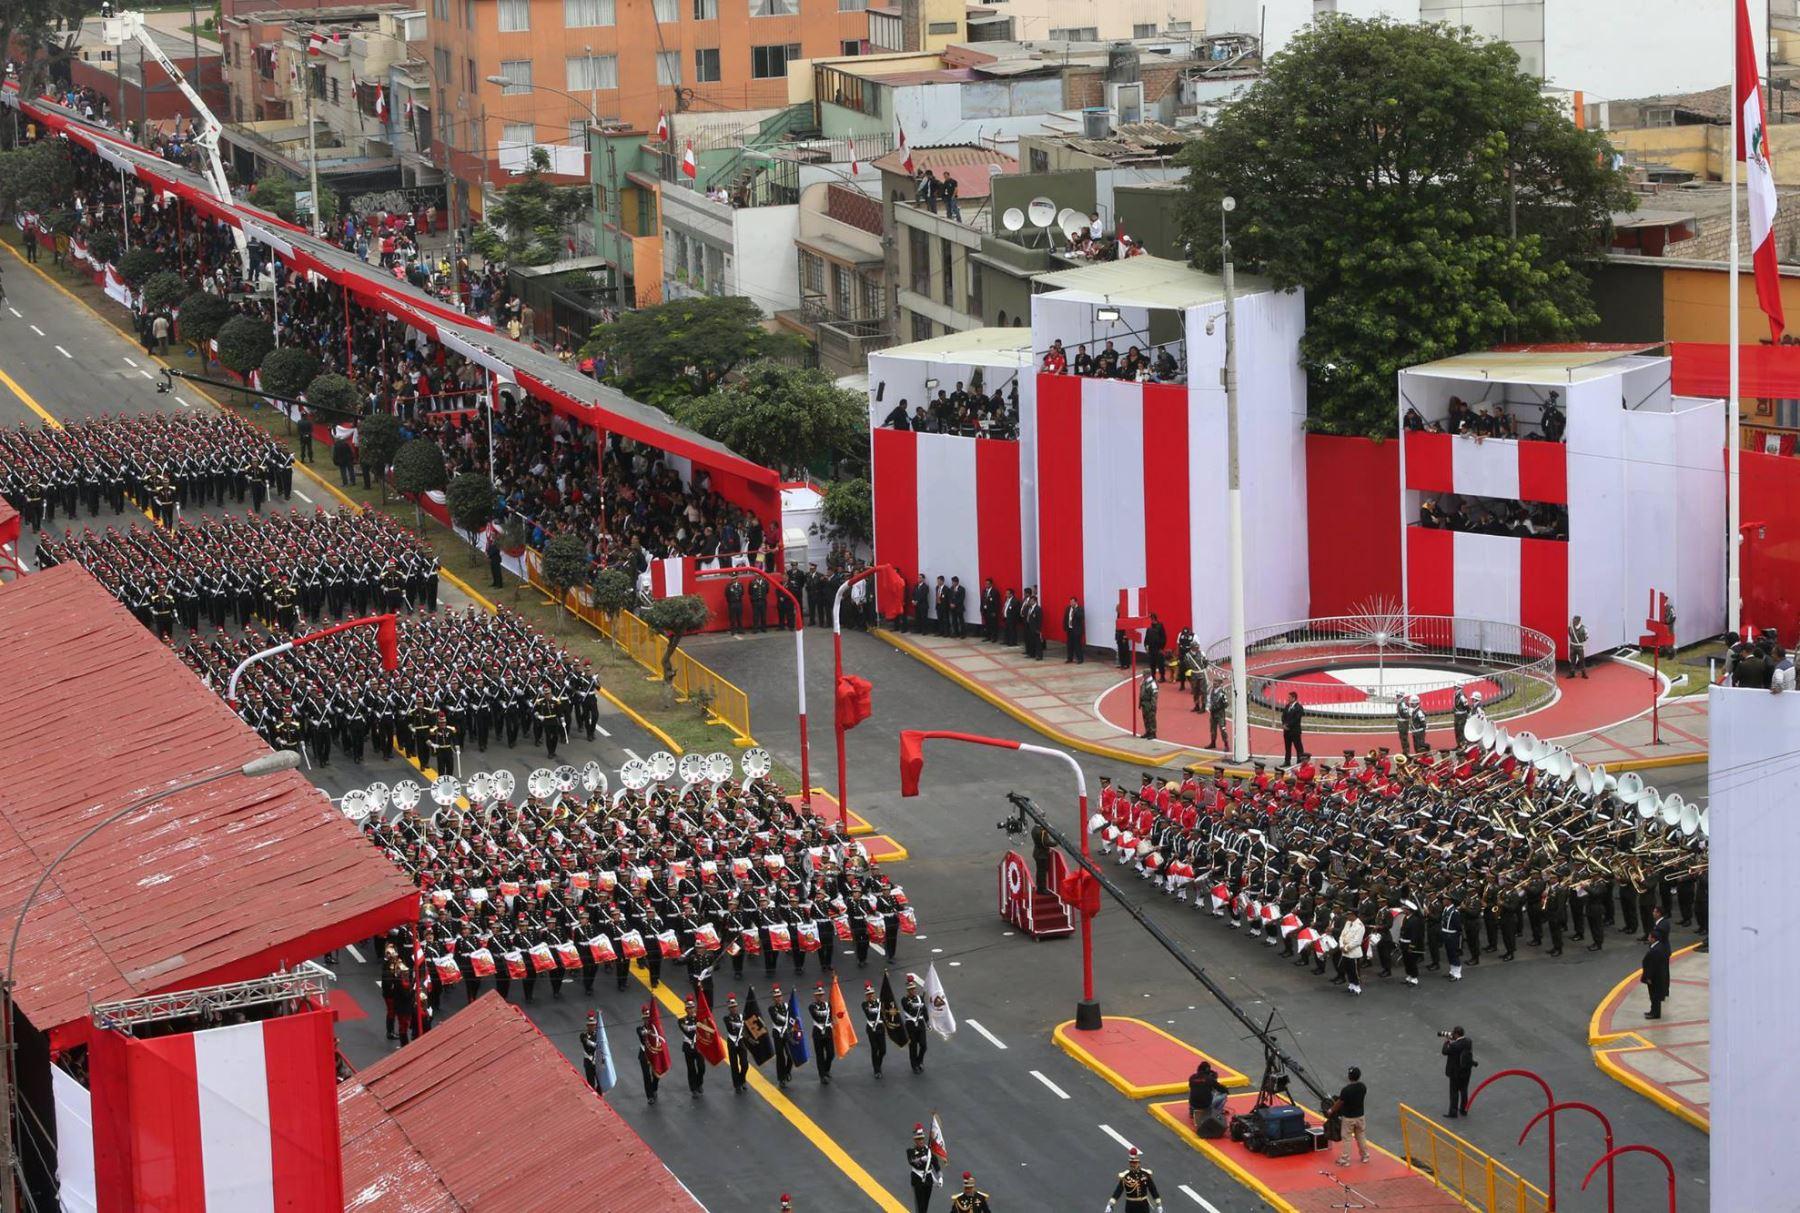 Peru Independence Day Celebrations Continue With Military Parade News Andina Peru News Agency